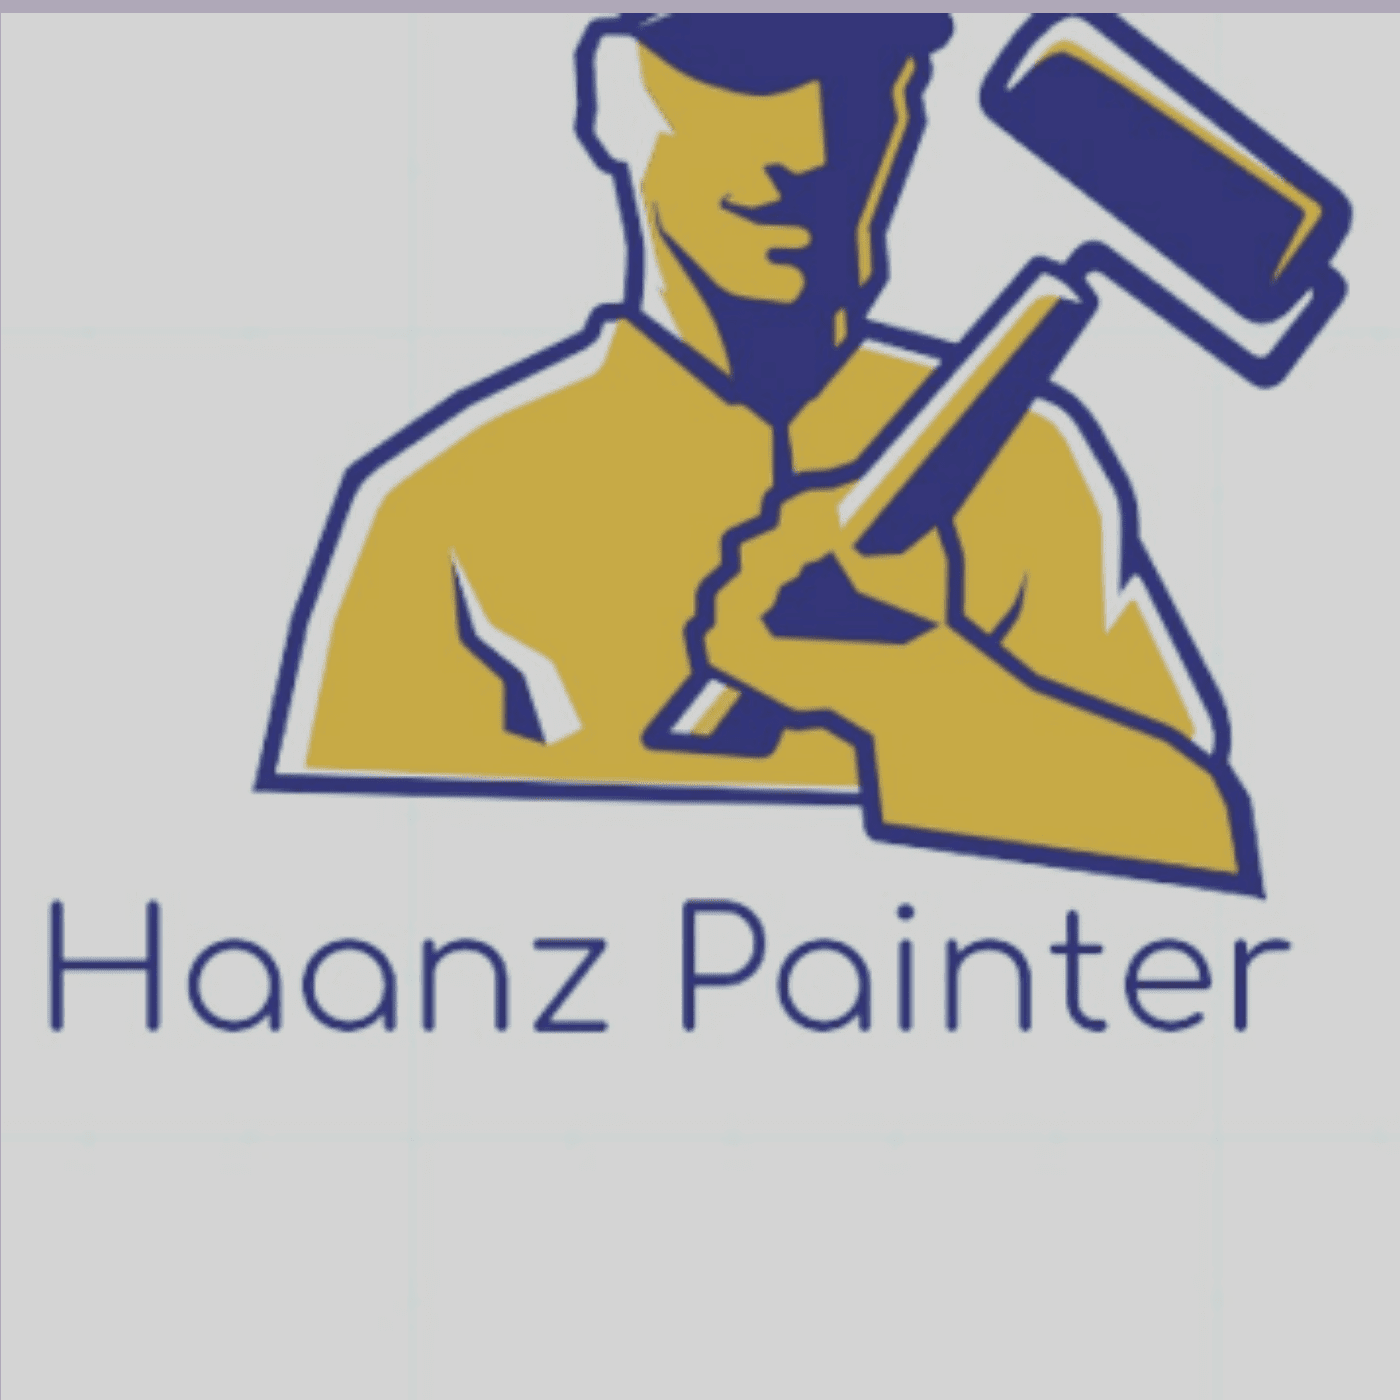 Haanz Painter - Stoke-On-Trent, Staffordshire ST1 2DG - 07526 370562 | ShowMeLocal.com